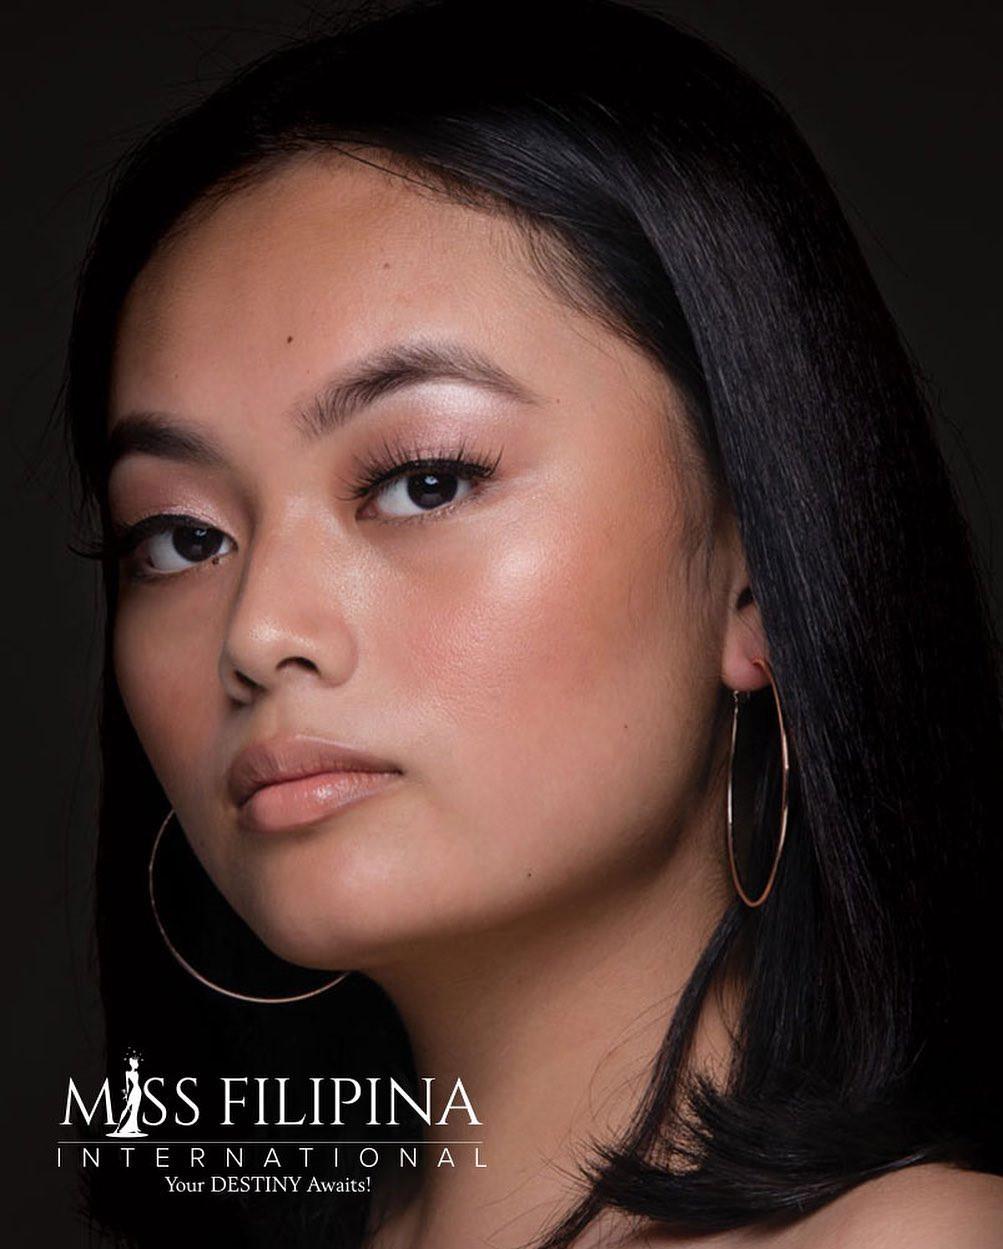 candidatas a miss filipina international 2021. final: 31 july. A5dlig